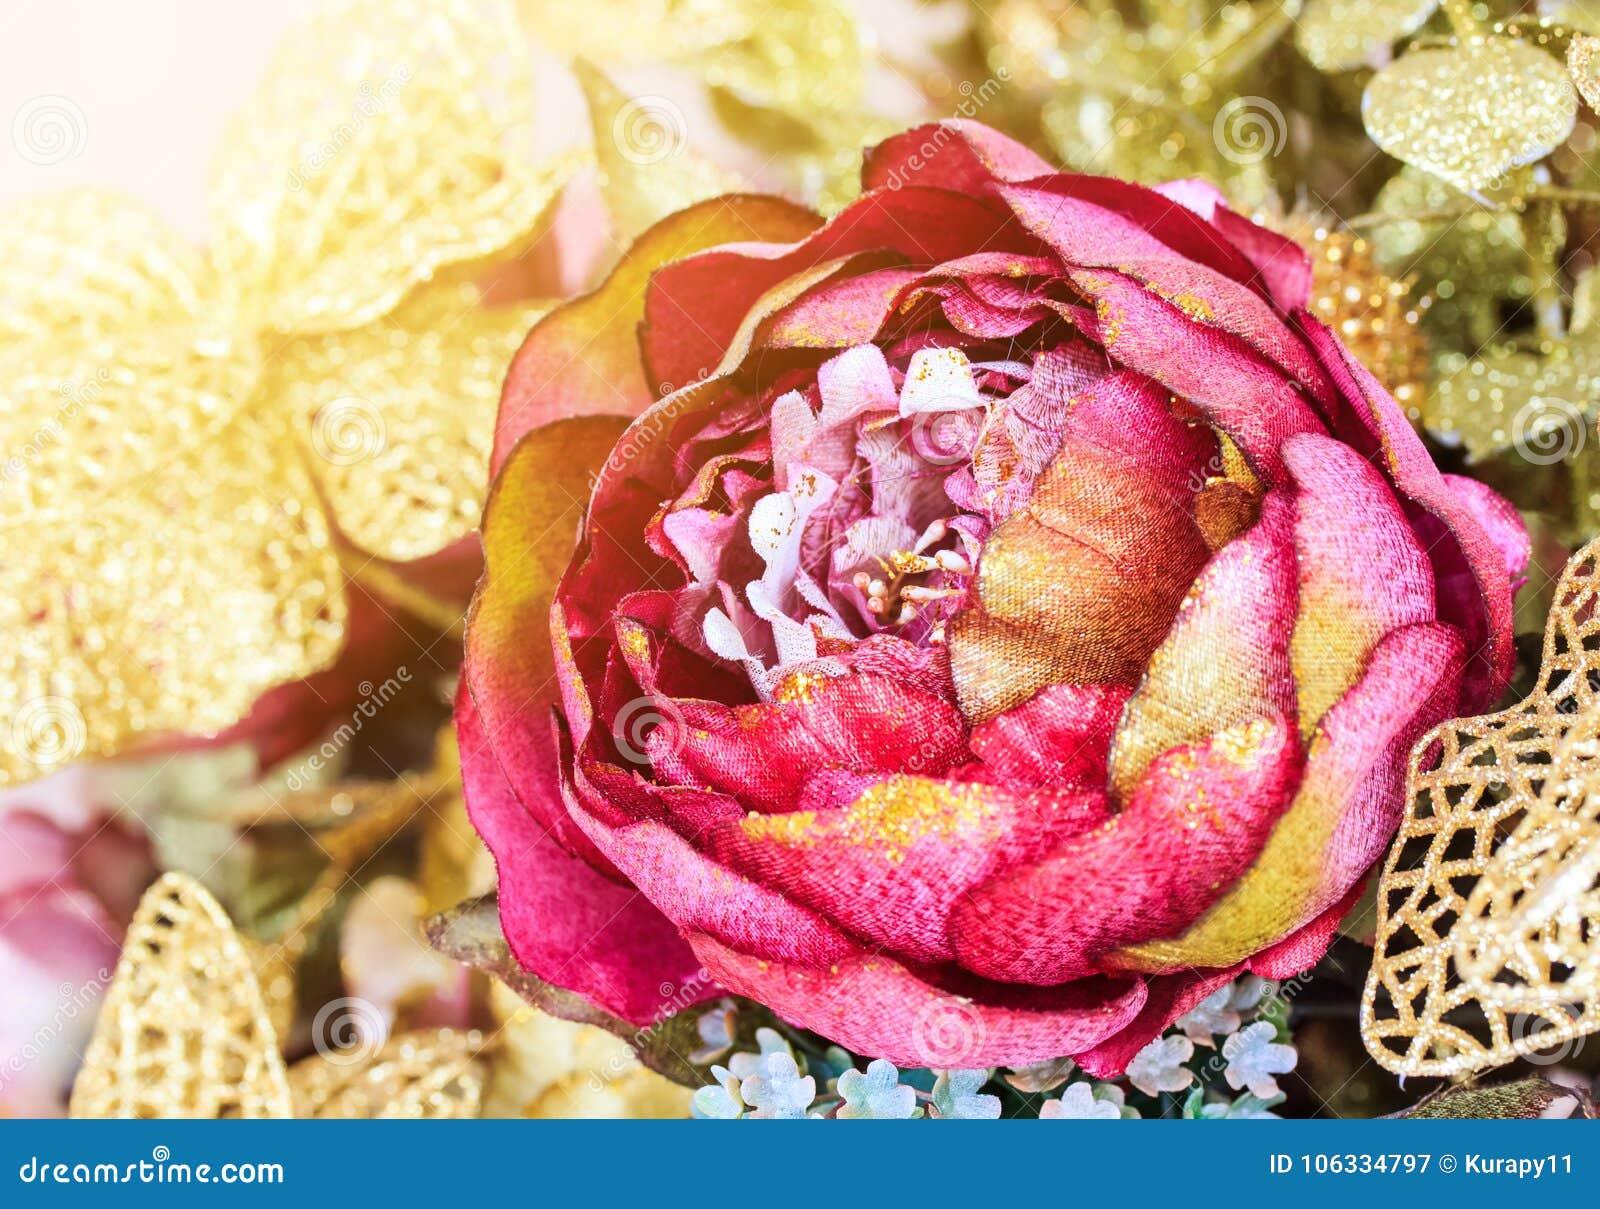 Plastic Lotus Flower Stock Image Image Of Nature Flower 106334797